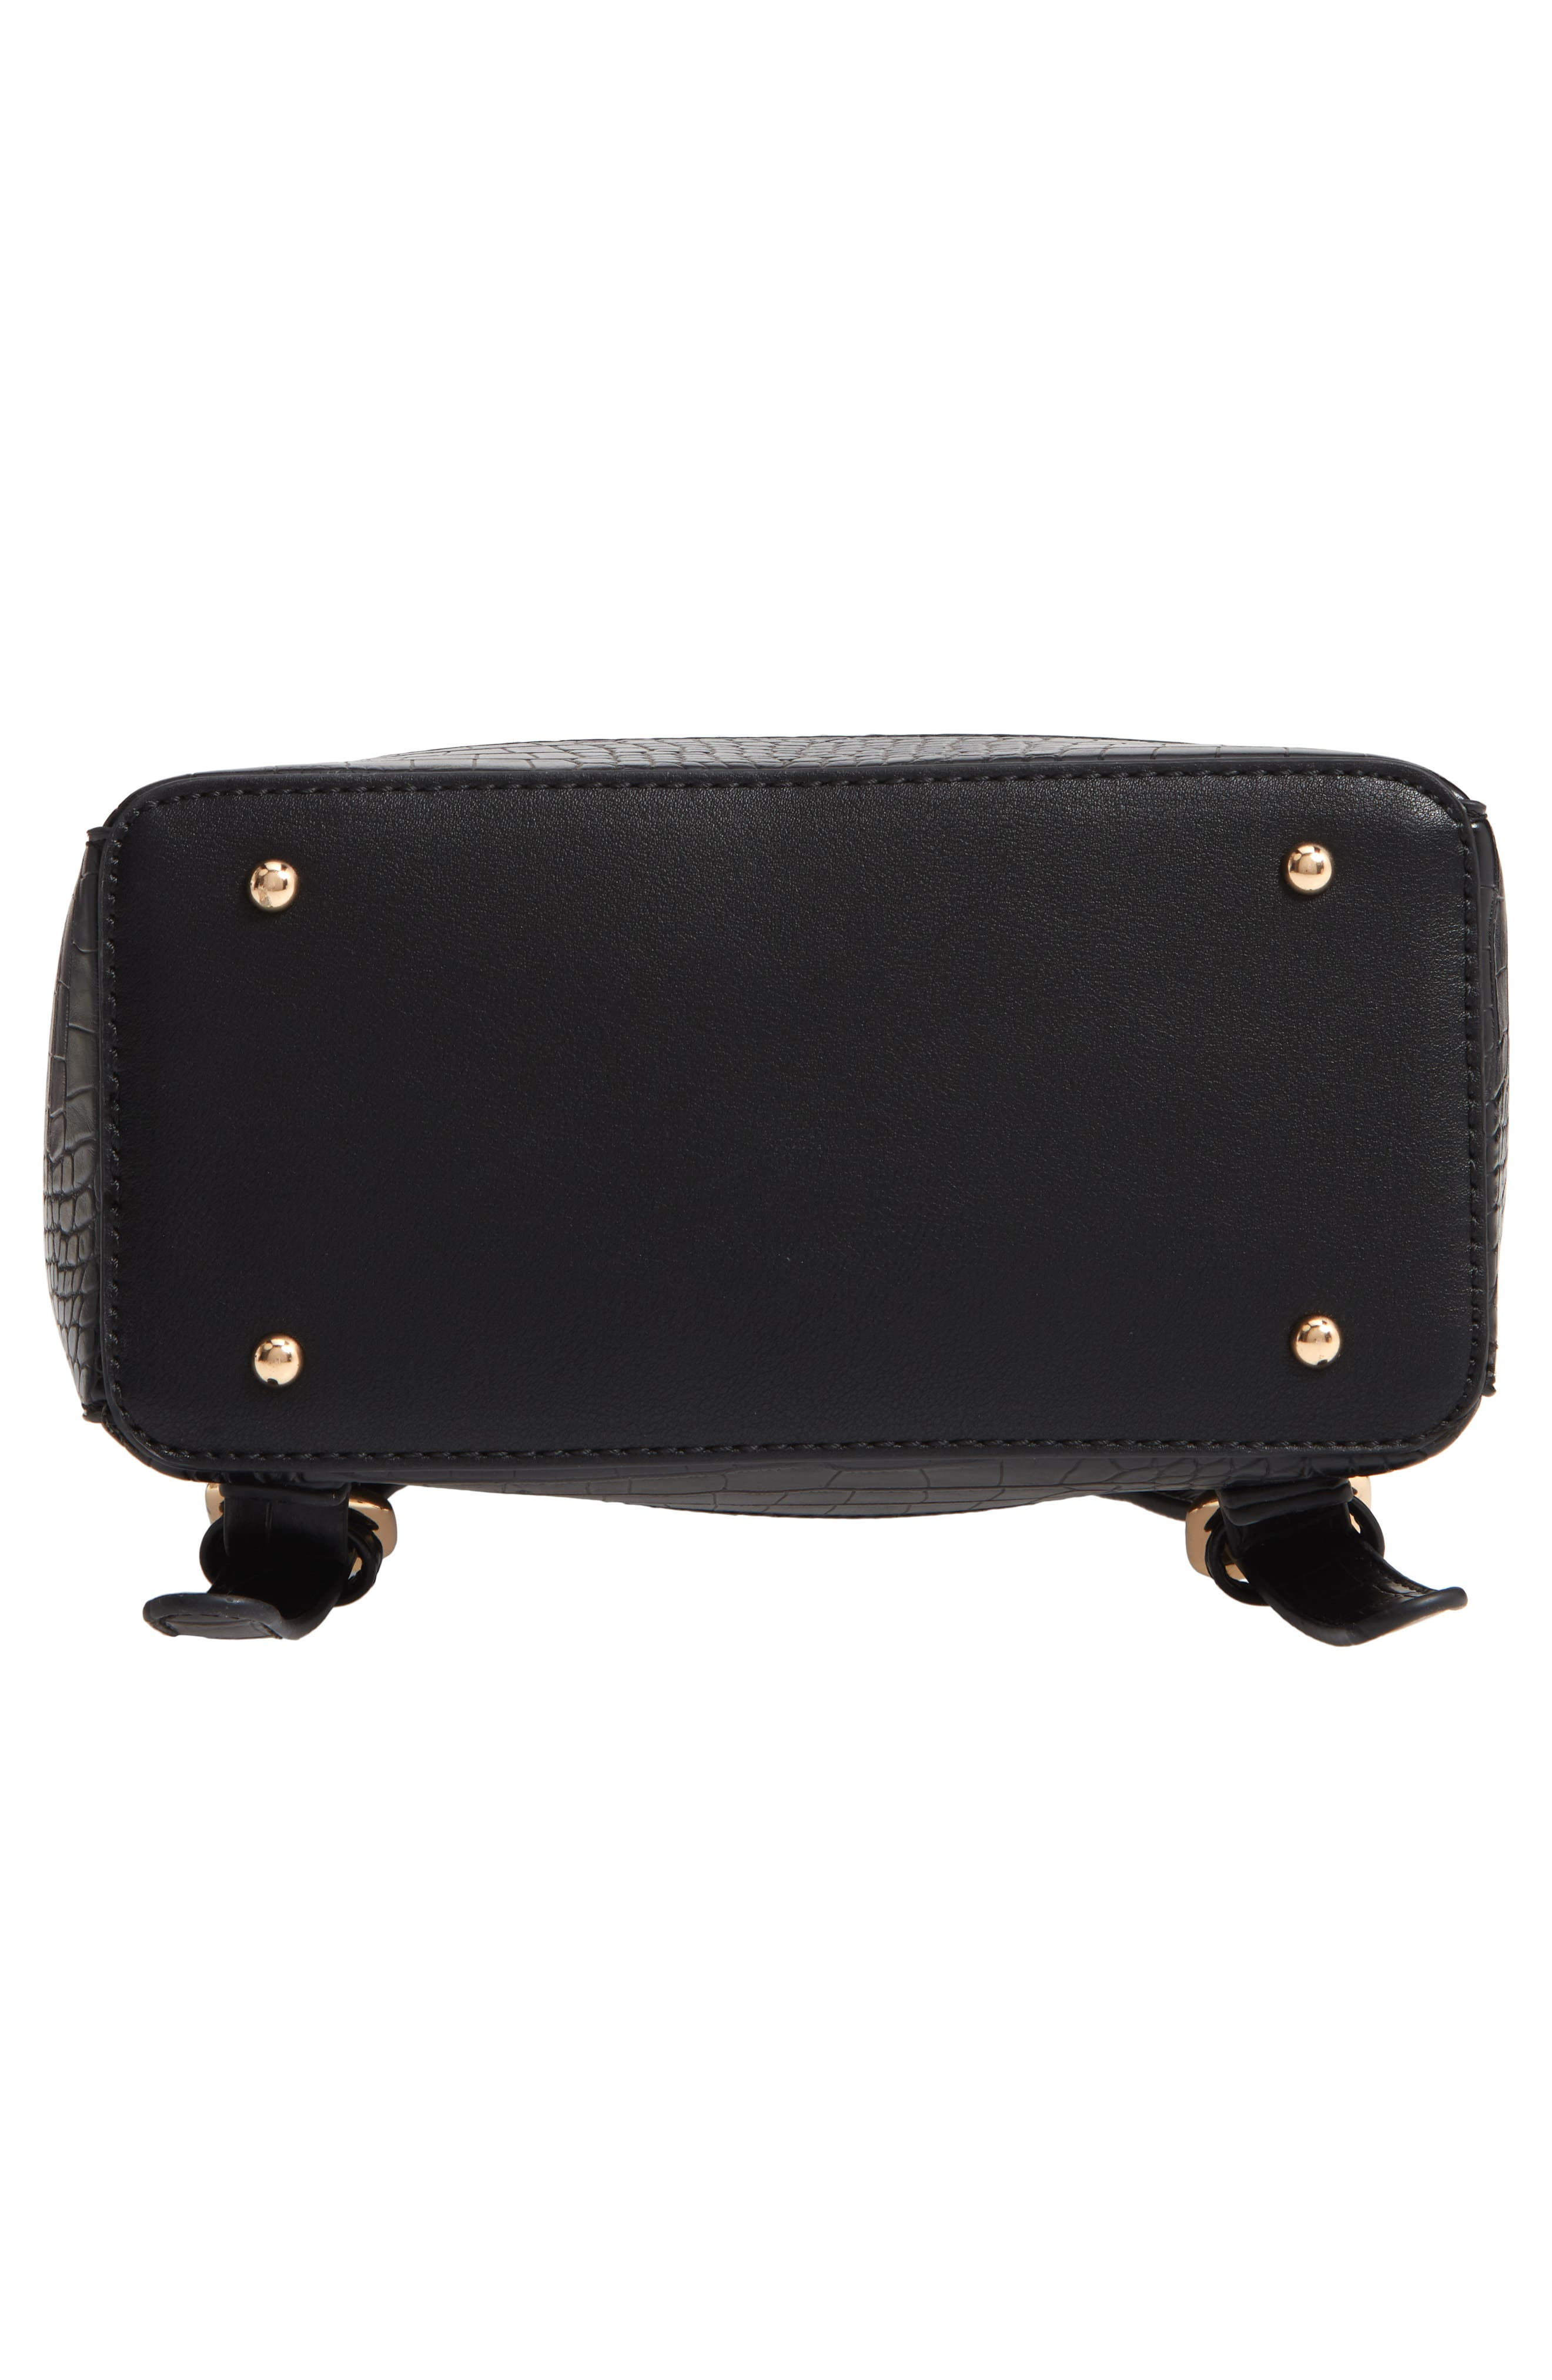 Jamya Croc Embossed Faux Leather Backpack,                             Alternate thumbnail 6, color,                             BLACK